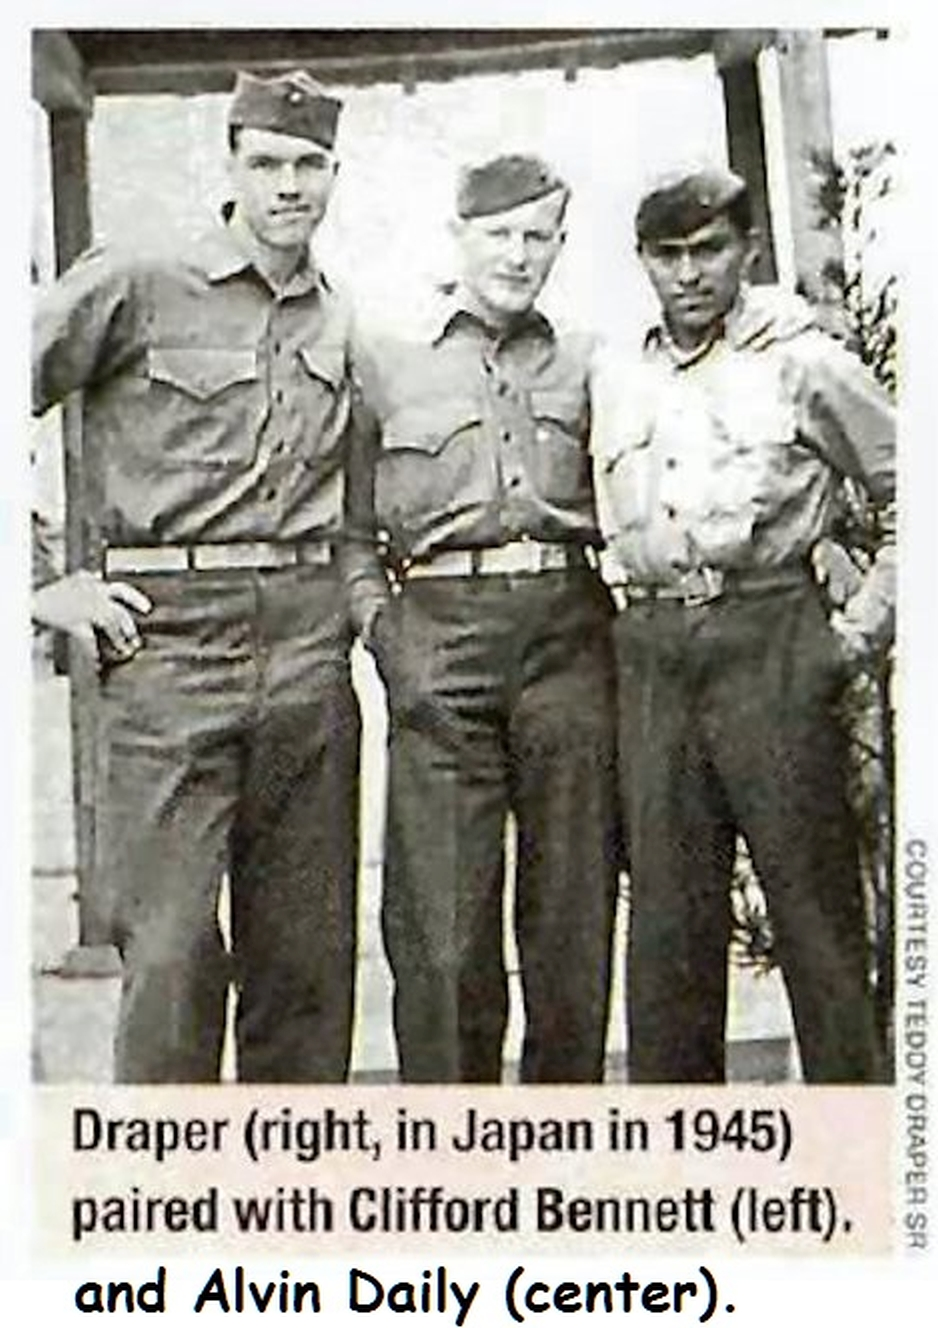 Alvin Leon Daily July 30, 1918 - June 1, 2012